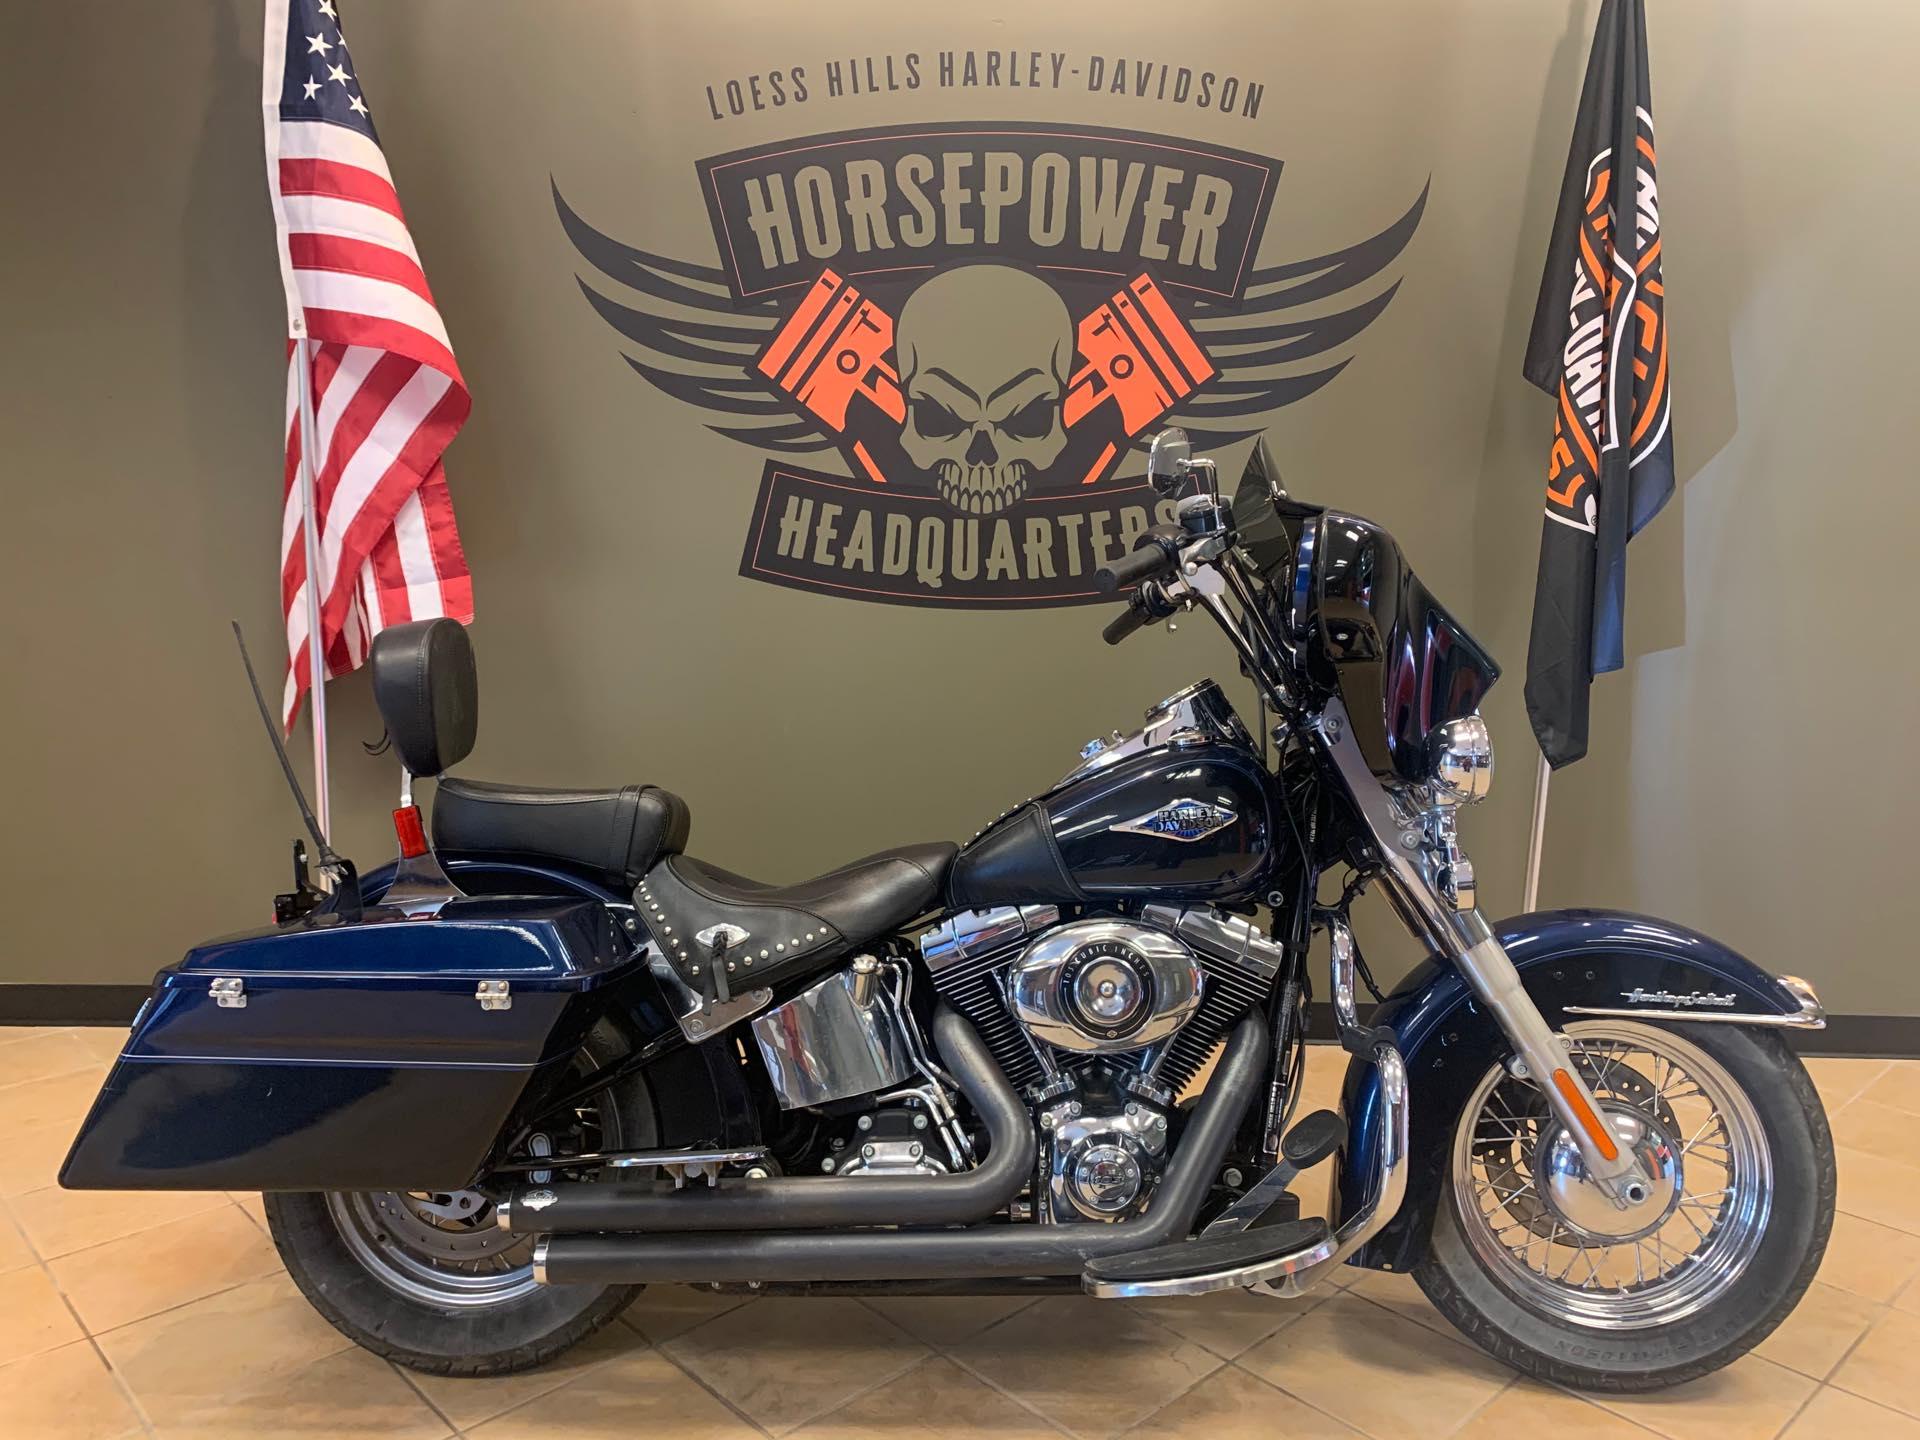 2014 Harley-Davidson Softail Heritage Softail Classic at Loess Hills Harley-Davidson